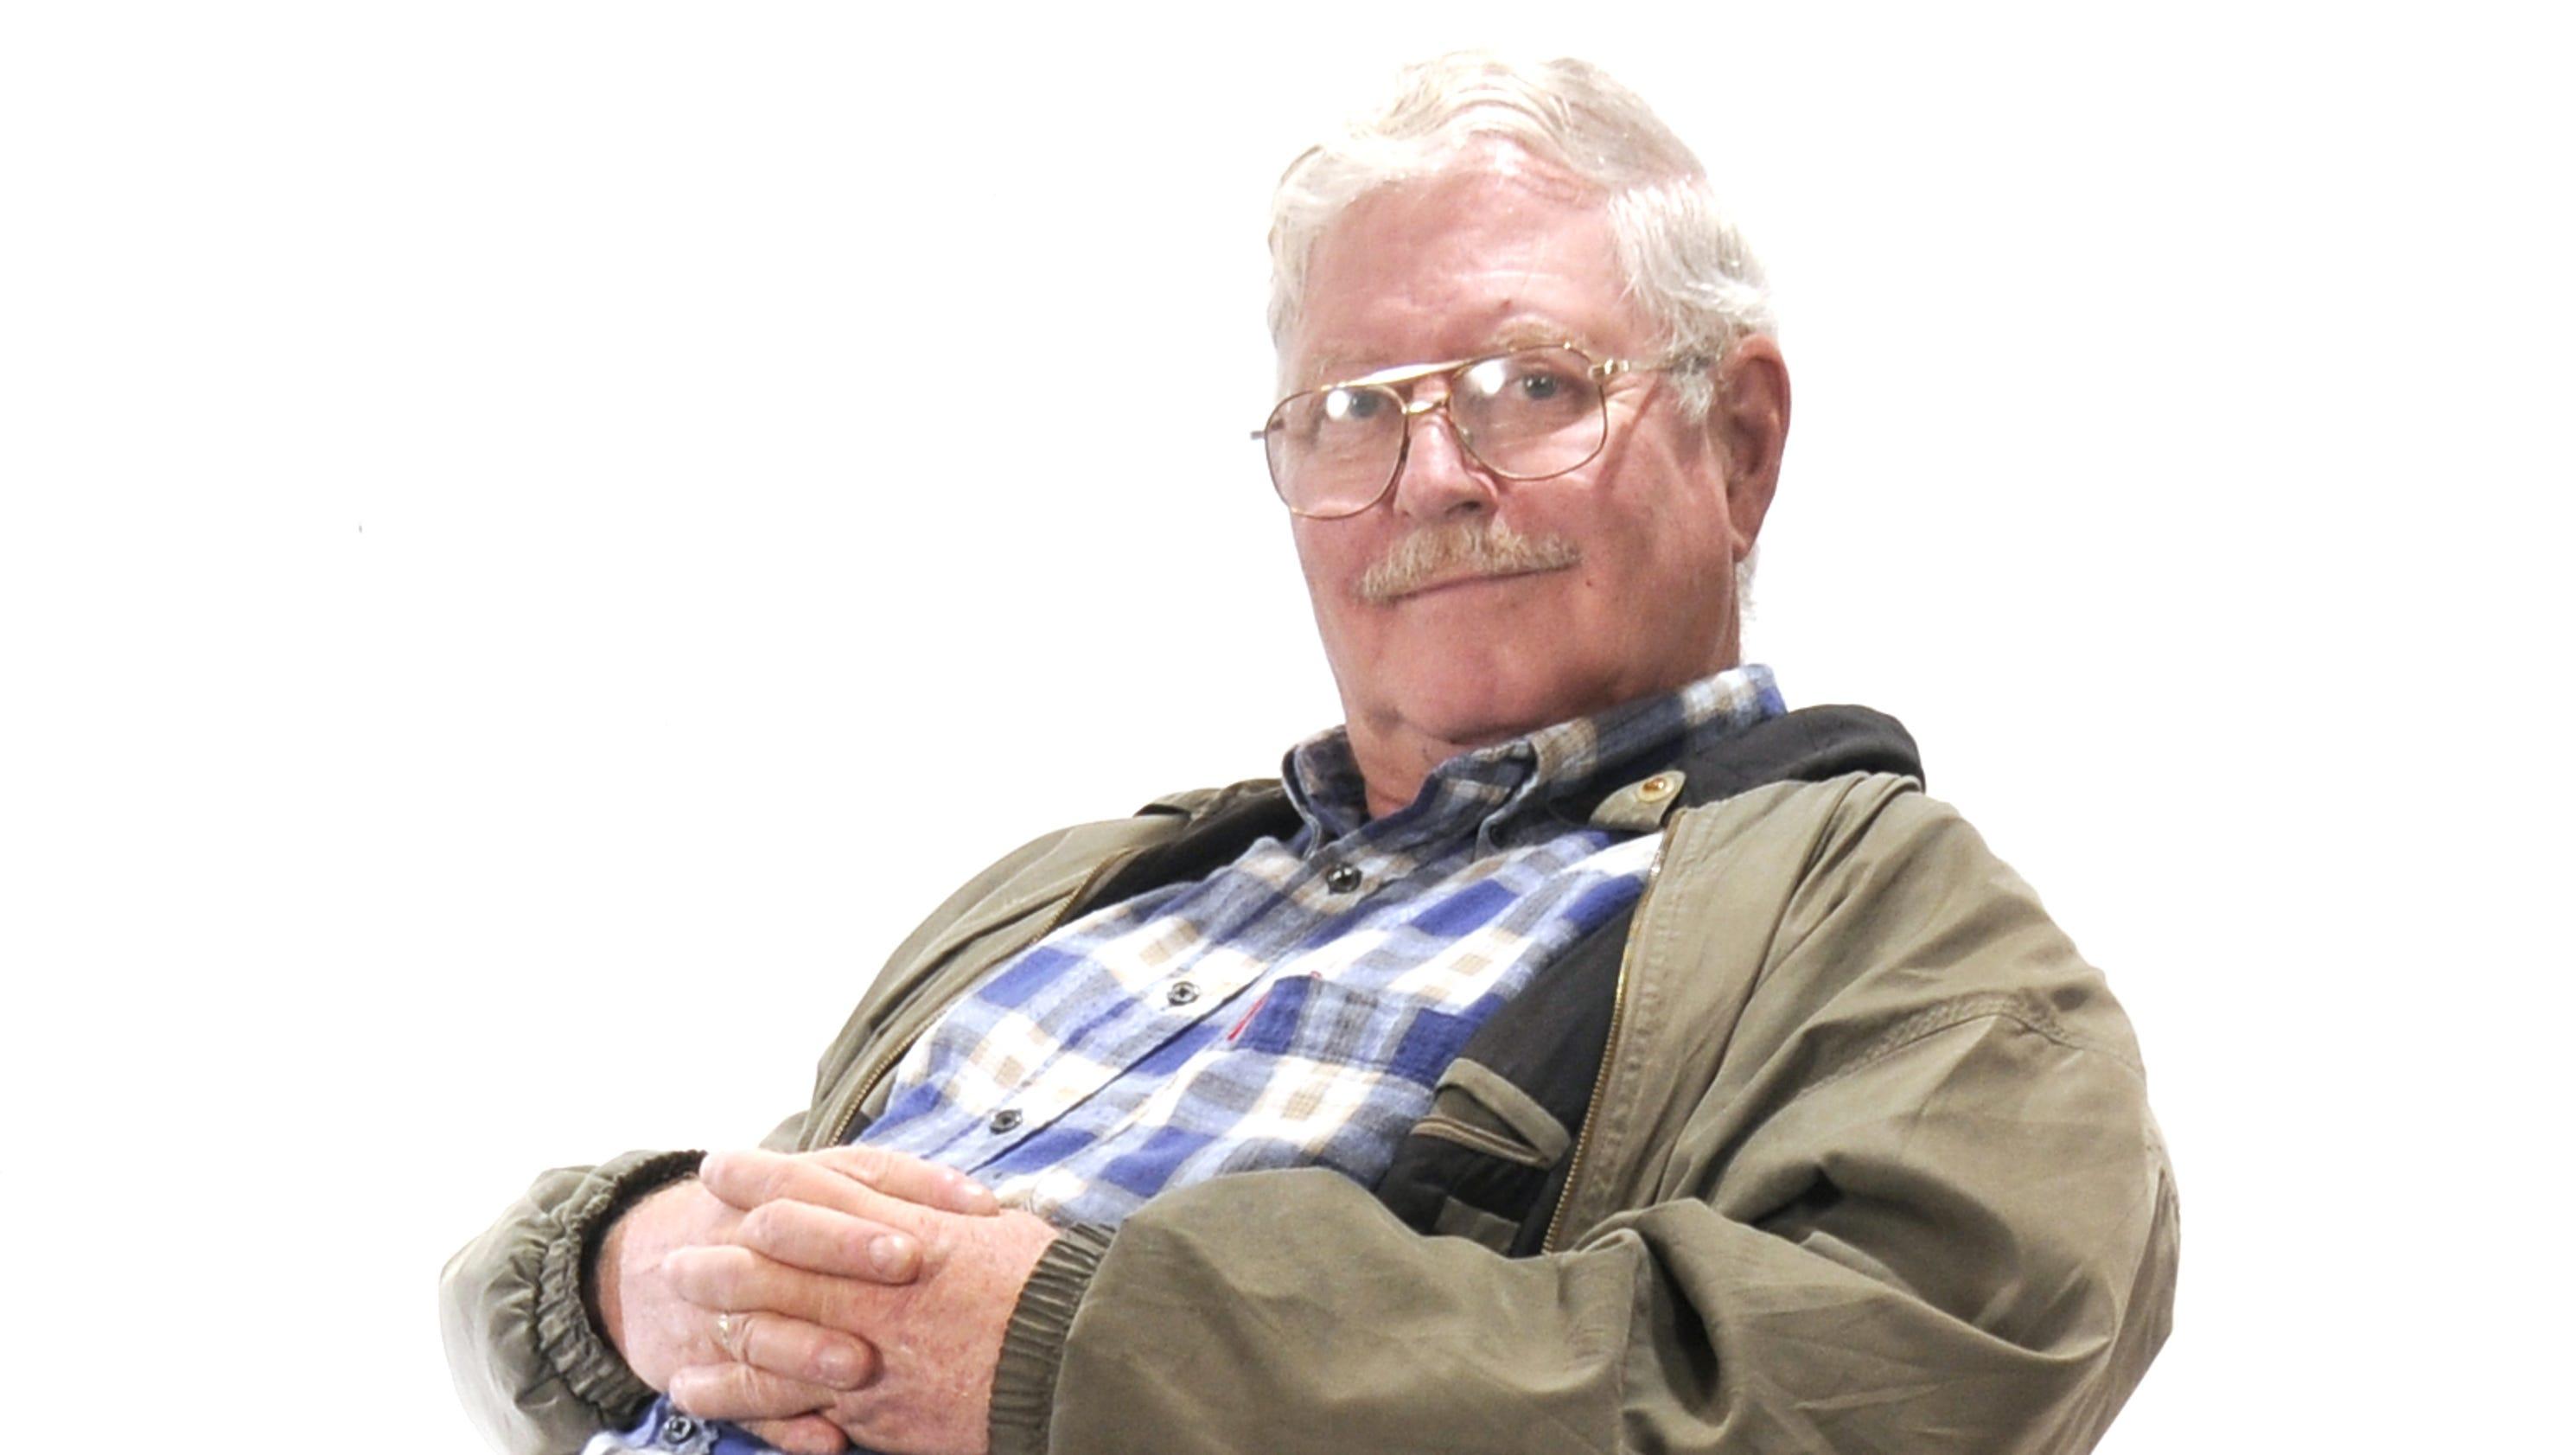 tom brennan mansfield has lost its great storyteller. Black Bedroom Furniture Sets. Home Design Ideas